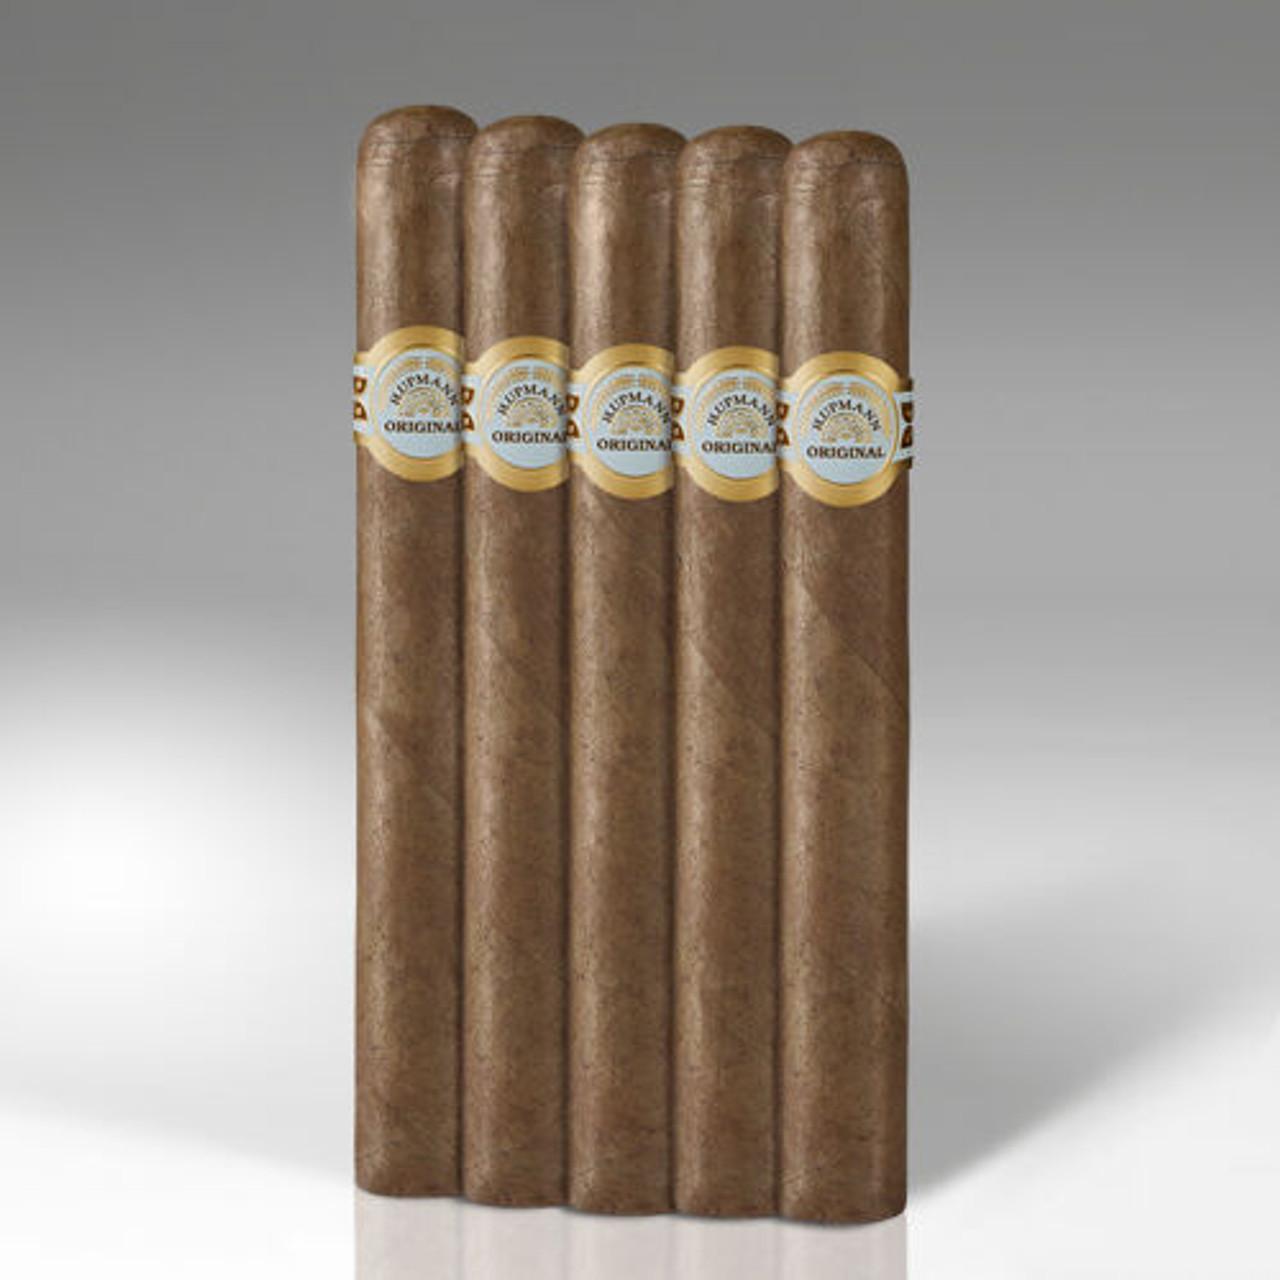 H. Upmann Original Corona Cigars - 5.5 x 44 (Pack of 5)